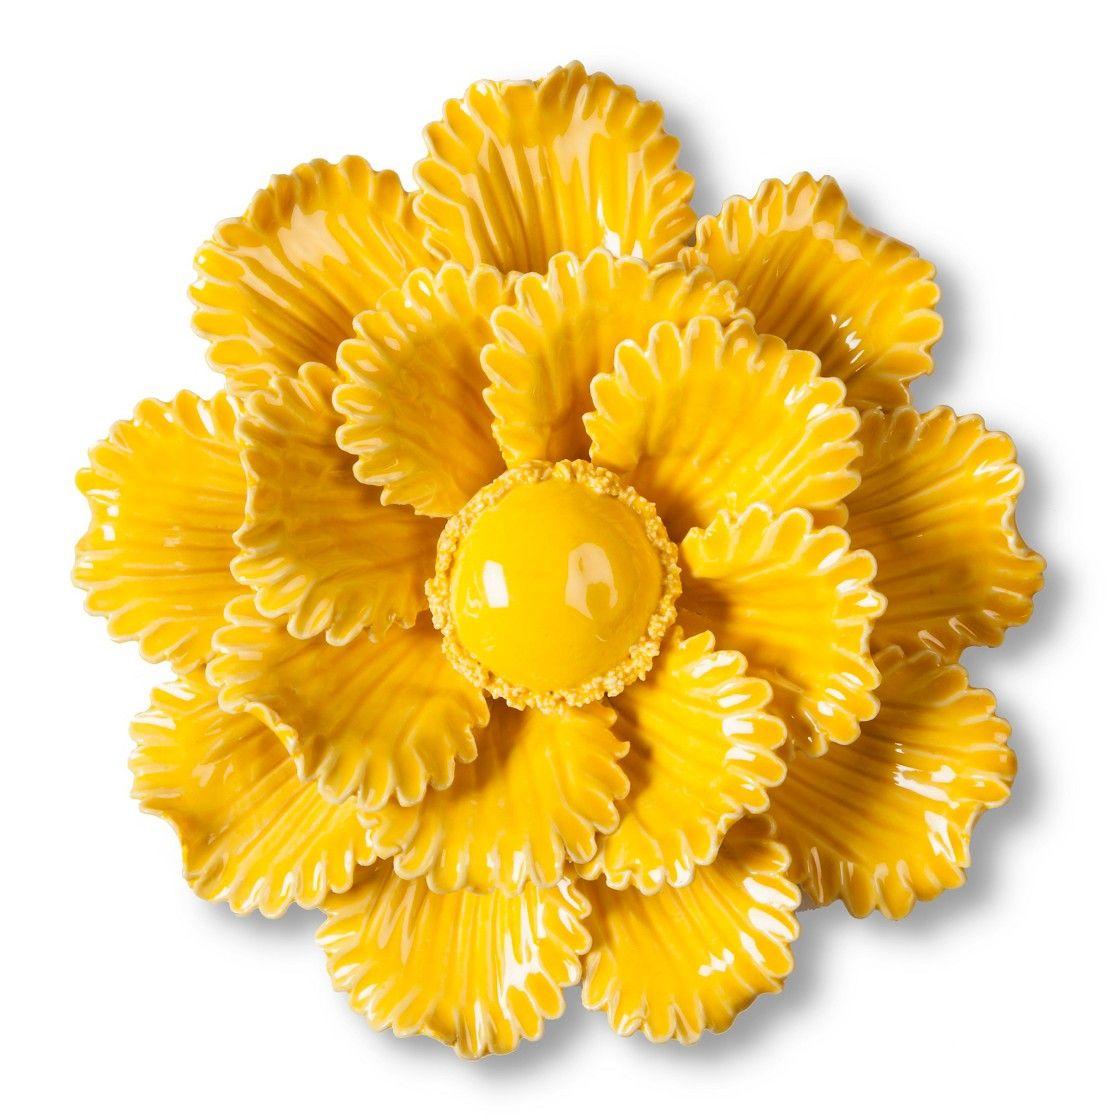 Ceramic Wall Flower Decor: Threshold Ceramic Flower Wall Sculpture - Yellow